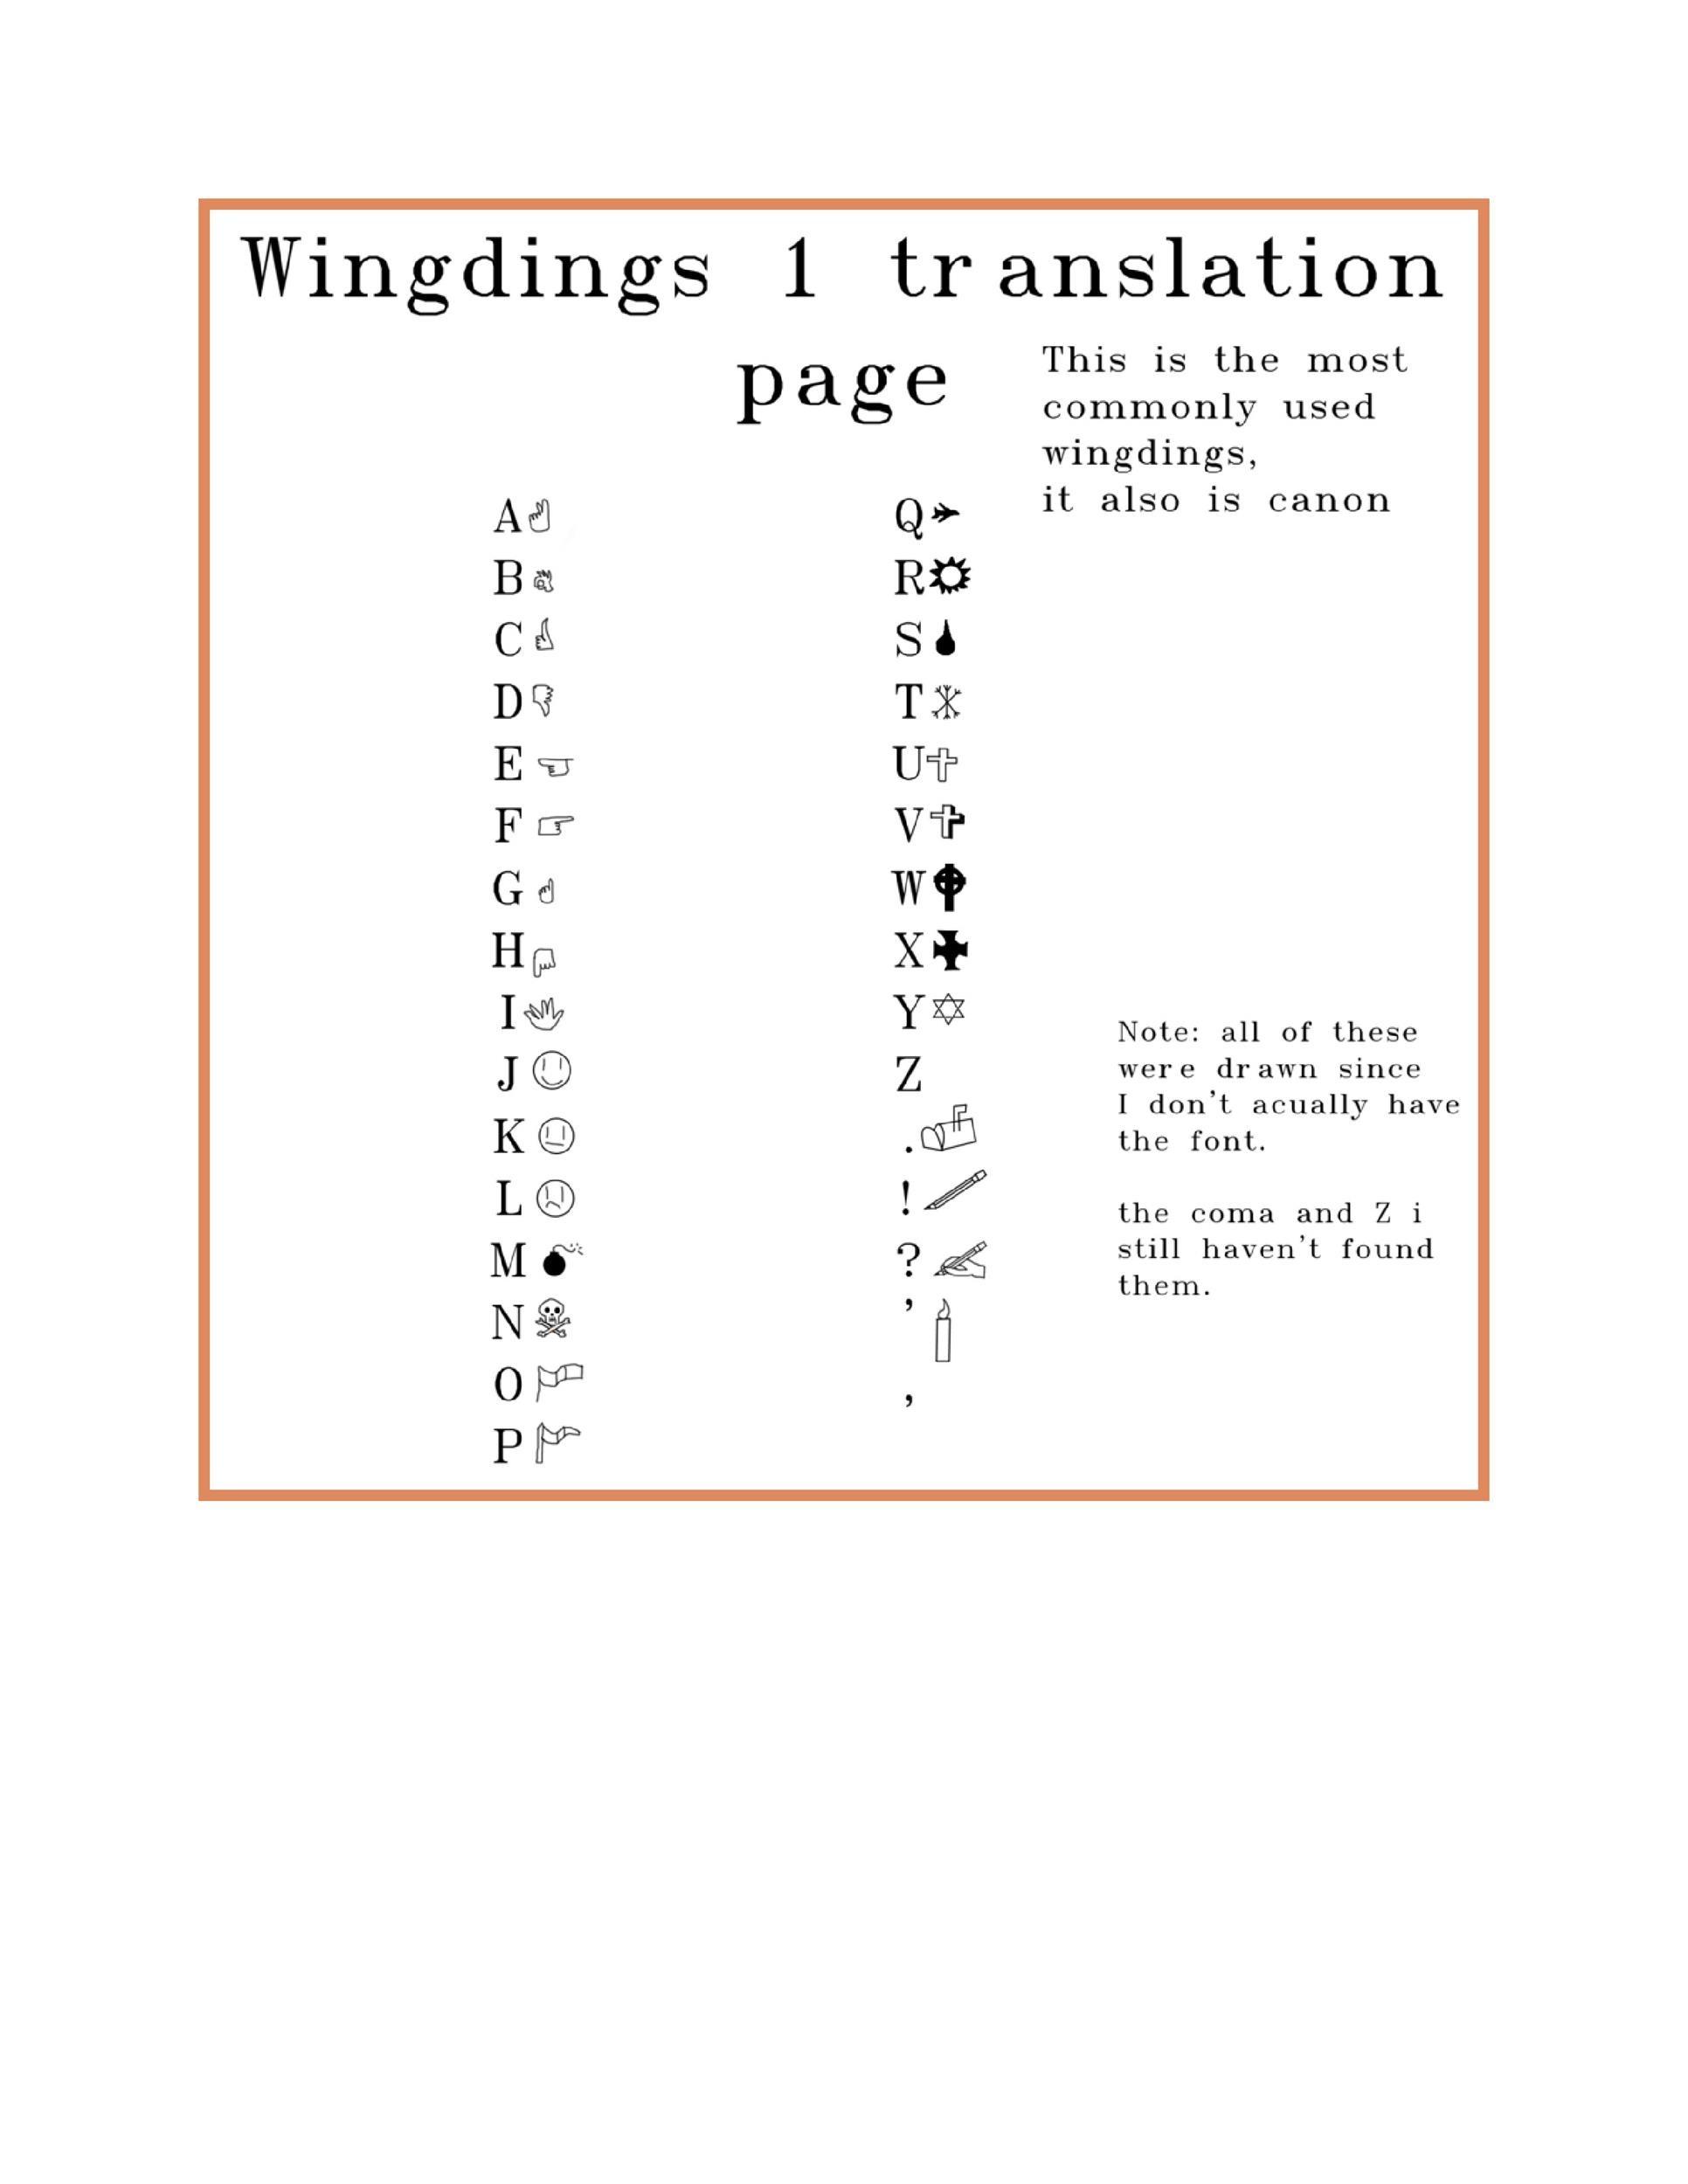 Free wingdings translator template 10